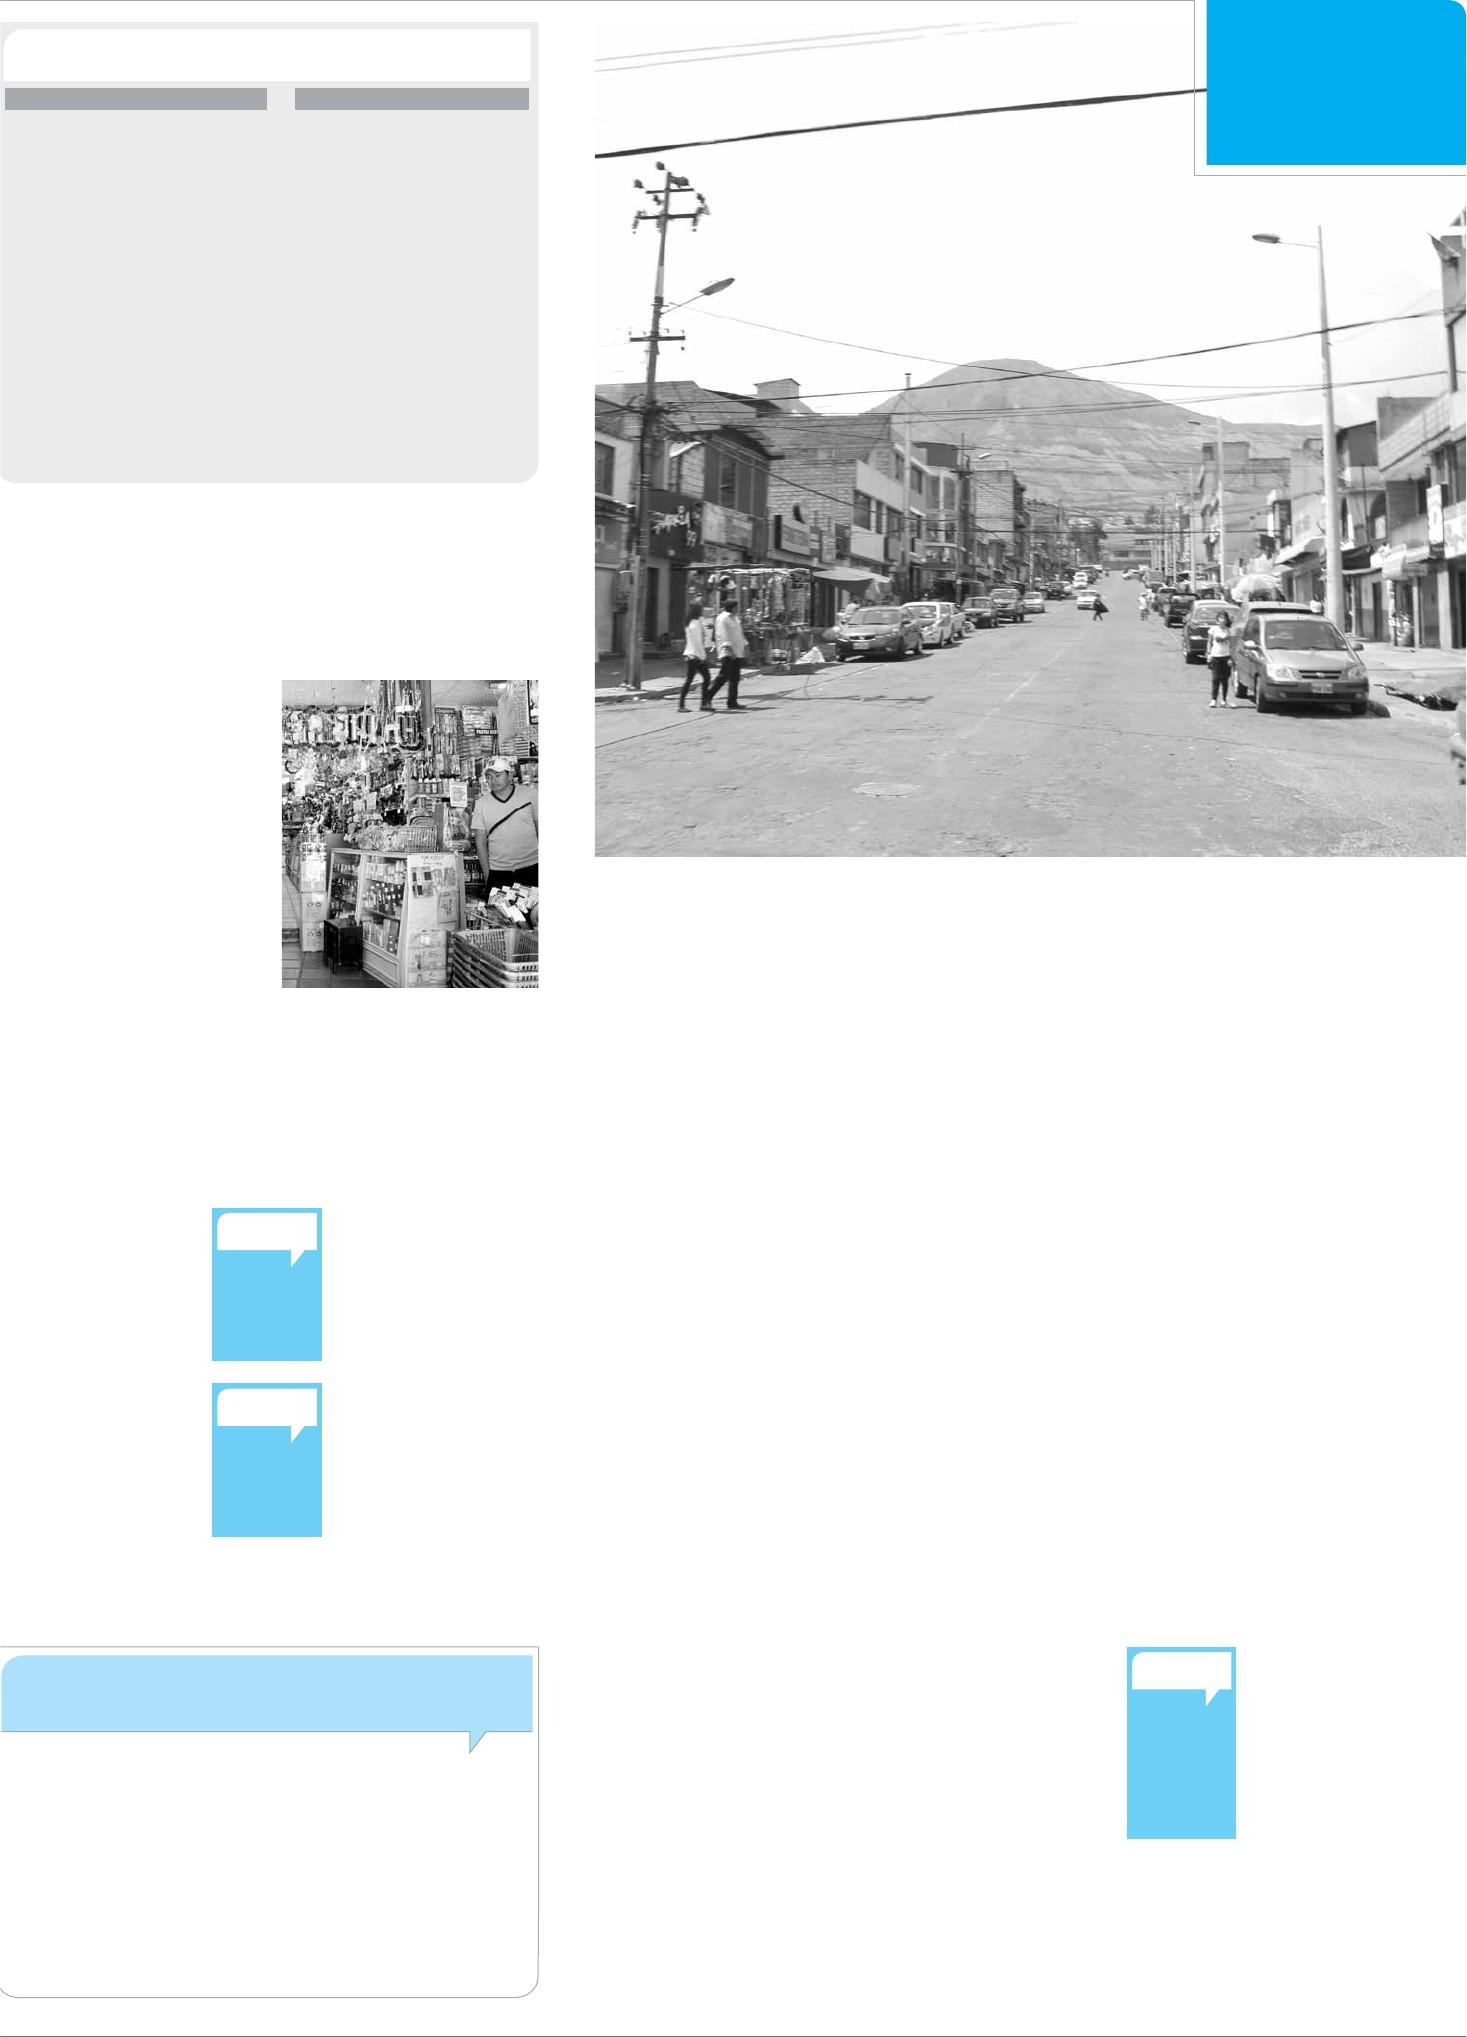 Calendario 2019 Valencia Para Imprimir Actual La Hora Quito 2 De Diciembre 2013 [pdf Document] Of Calendario 2019 Valencia Para Imprimir Más Populares B Df Cuartoz Las Precioso Iluminacion Cocina Led